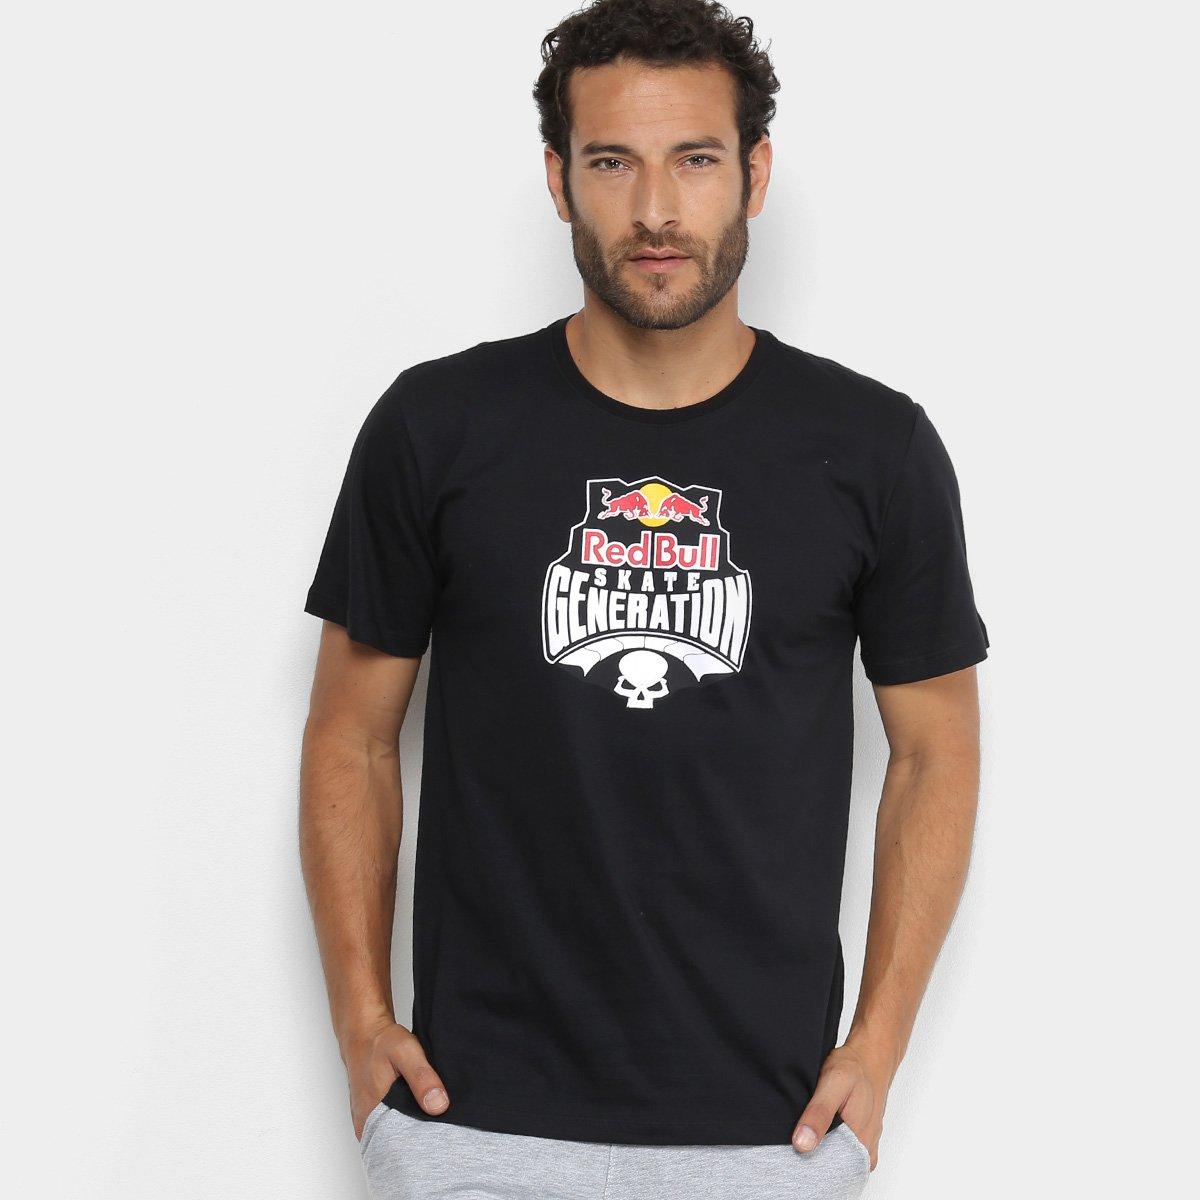 Camiseta Red Bull Skate Generation Masculina 90d5268200e